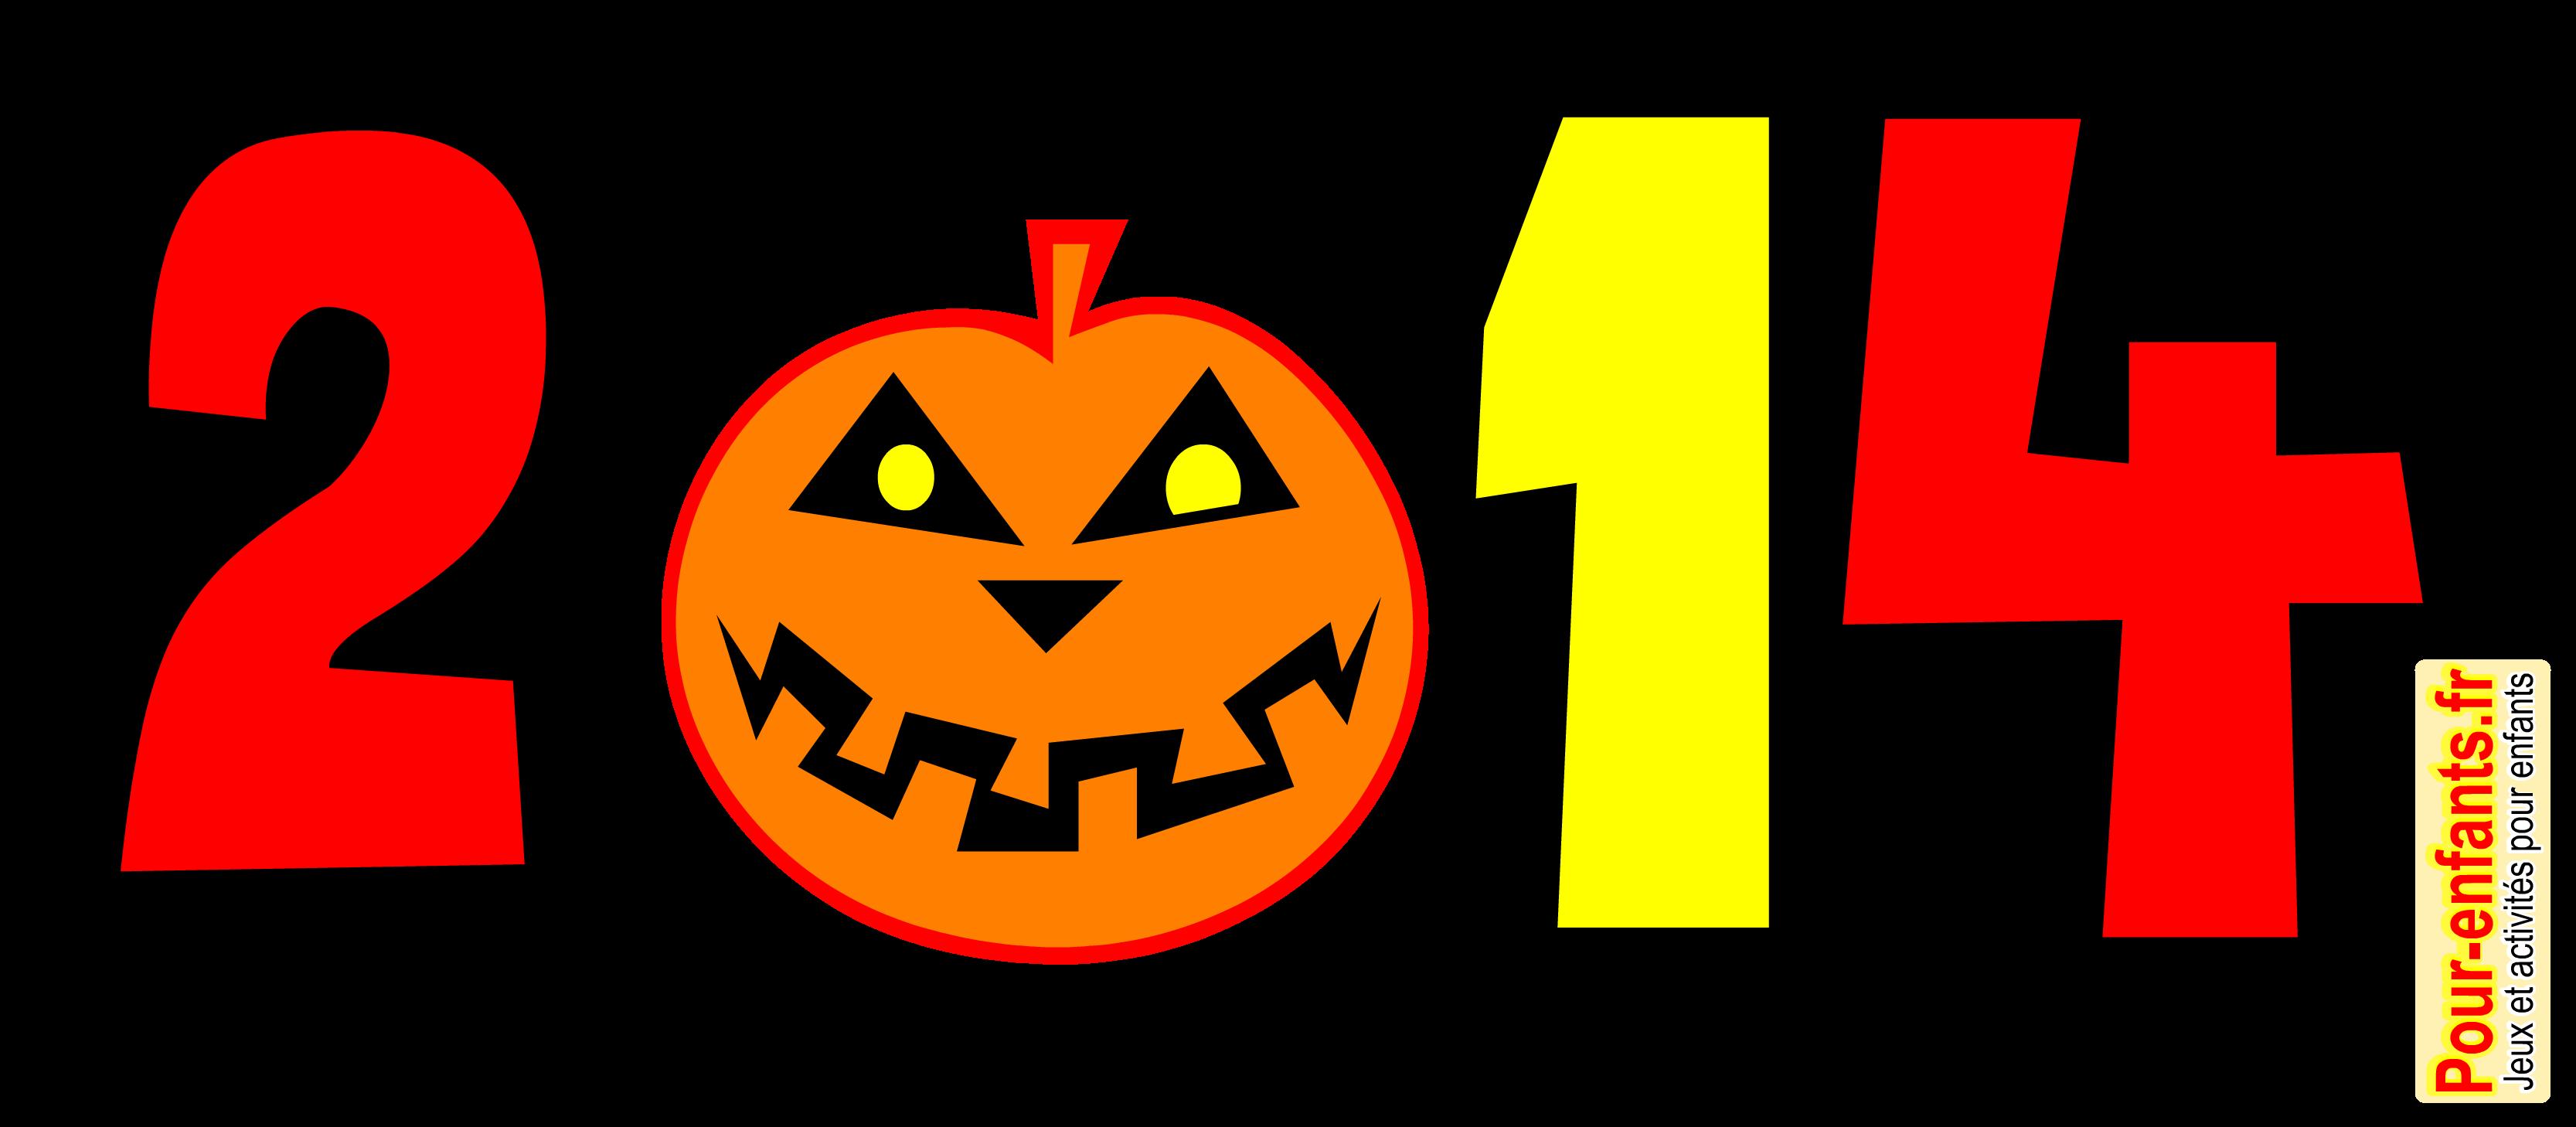 Halloween 2014 Dessin Date A Imprimer Dessins Citrouille Coloriage